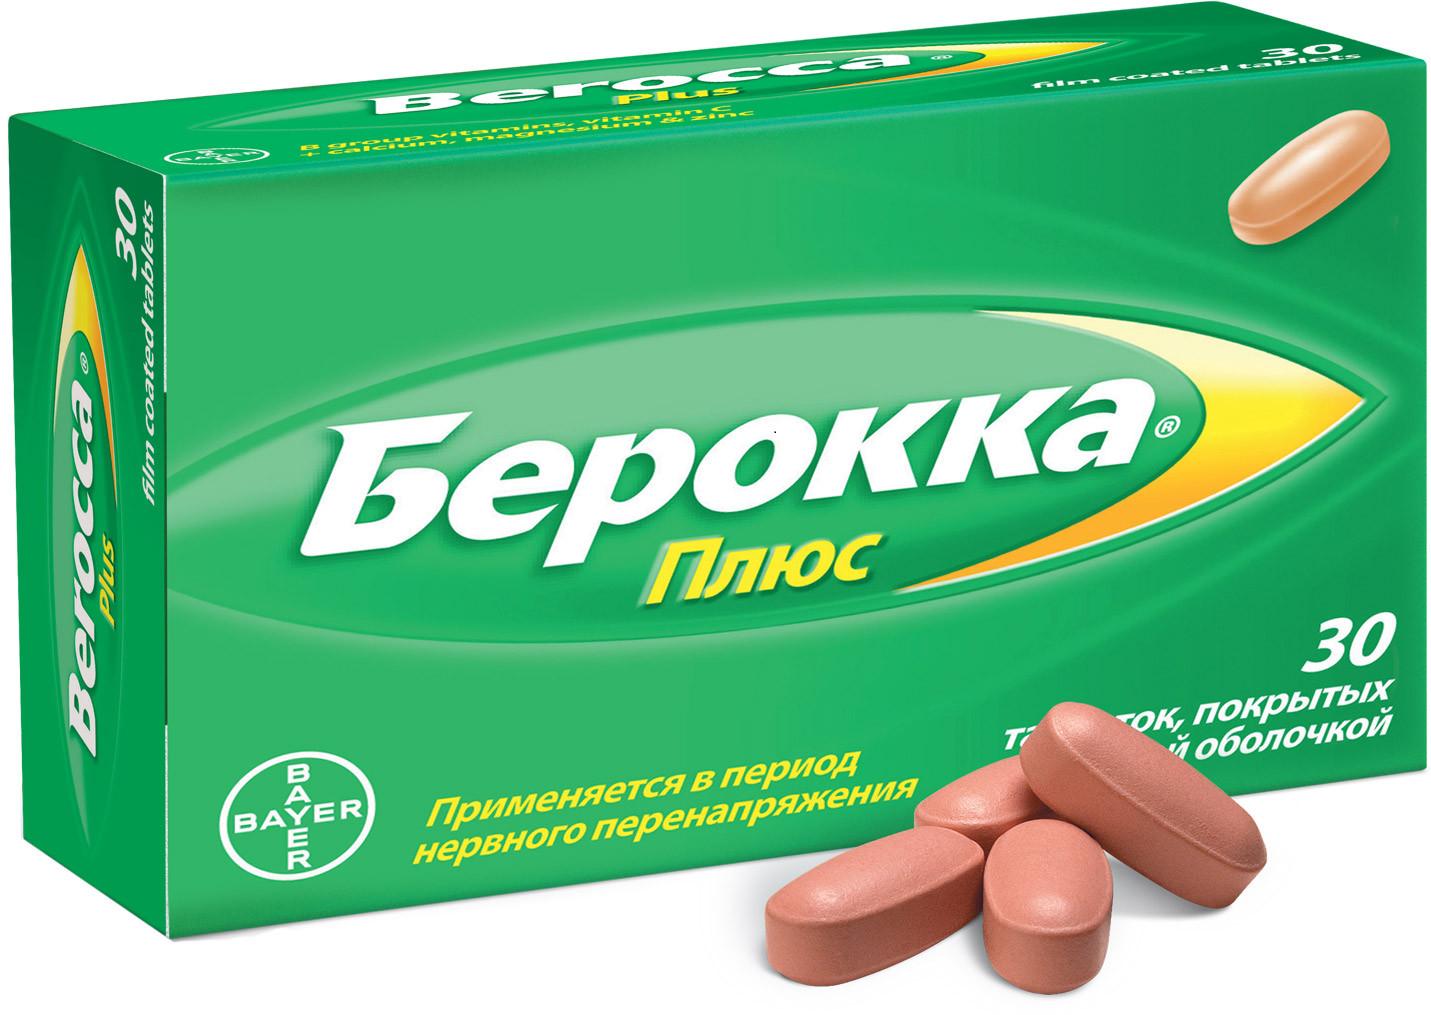 Фото препарата Берокка плюс таблетки покрытые оболочкой блистер